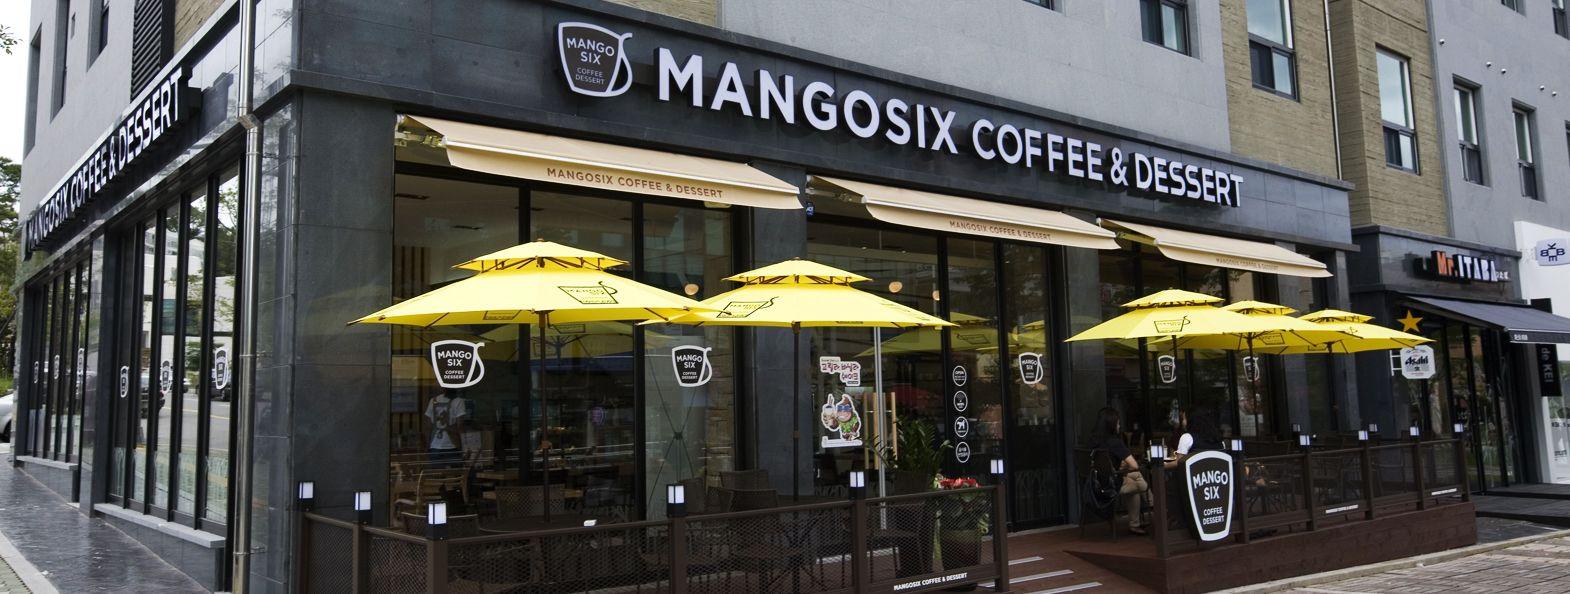 Mango Six Cofee & Dessert